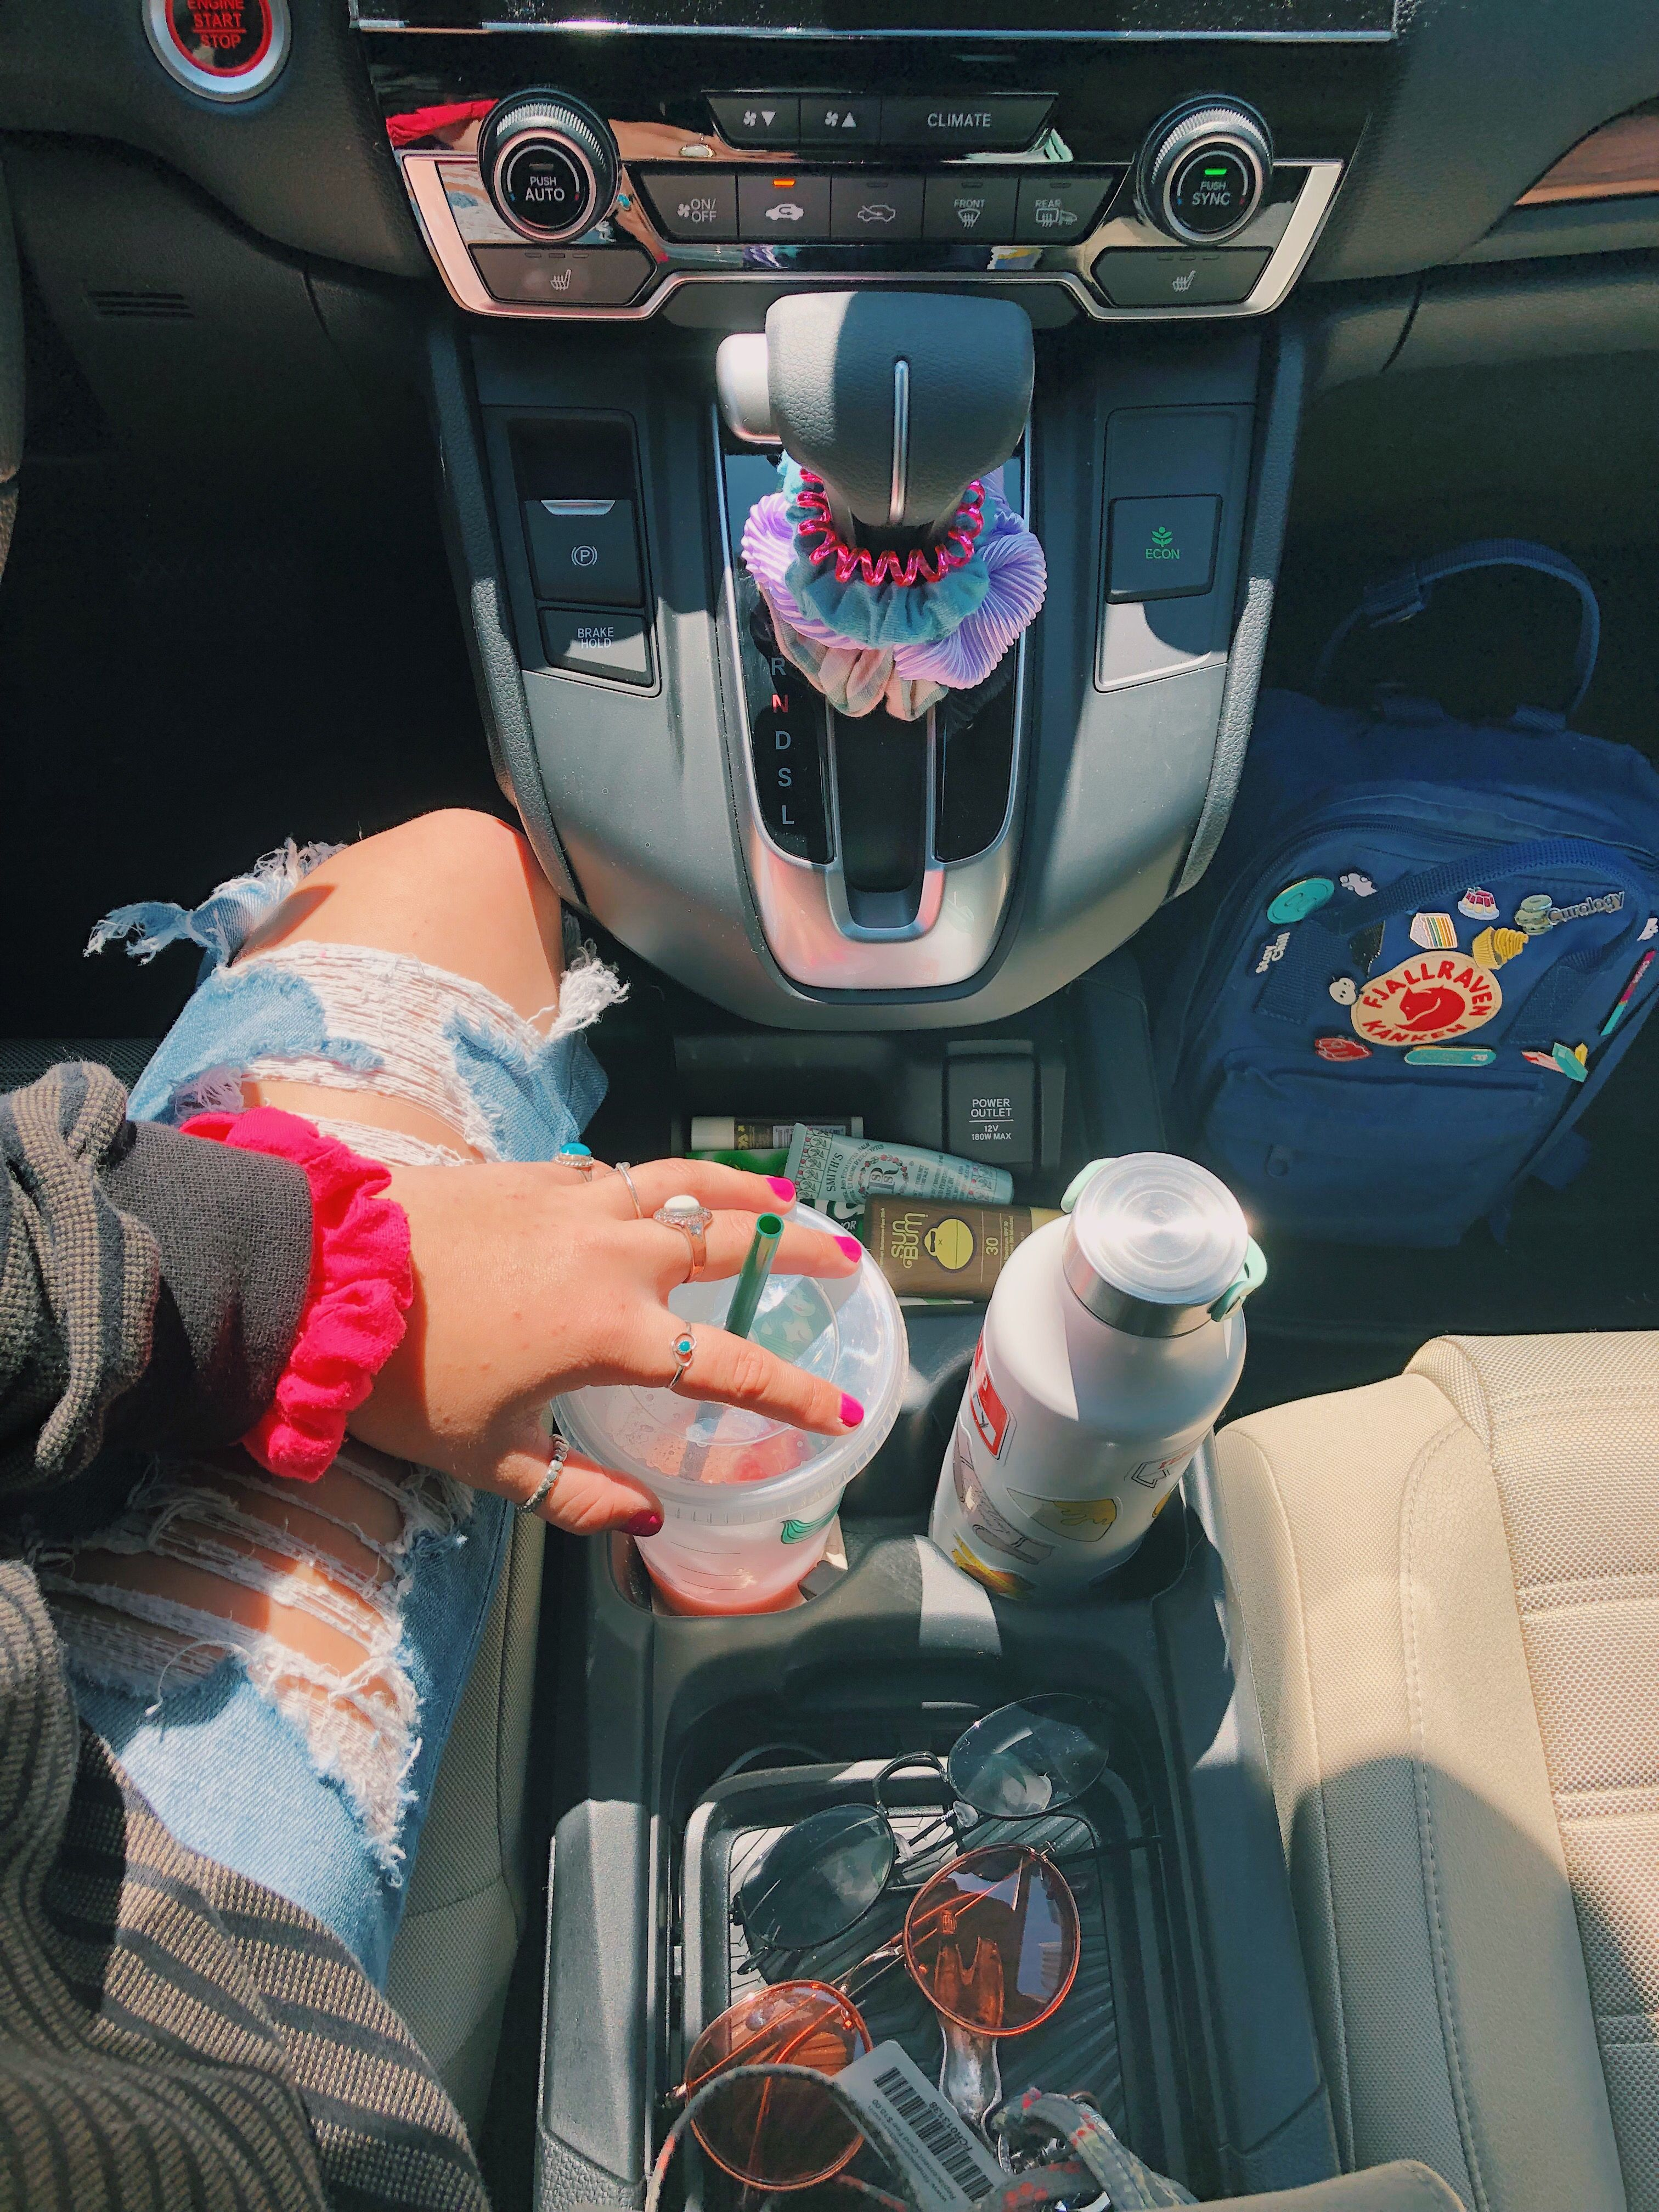 Pin By Lauren On Summer Cute Car Accessories Cars